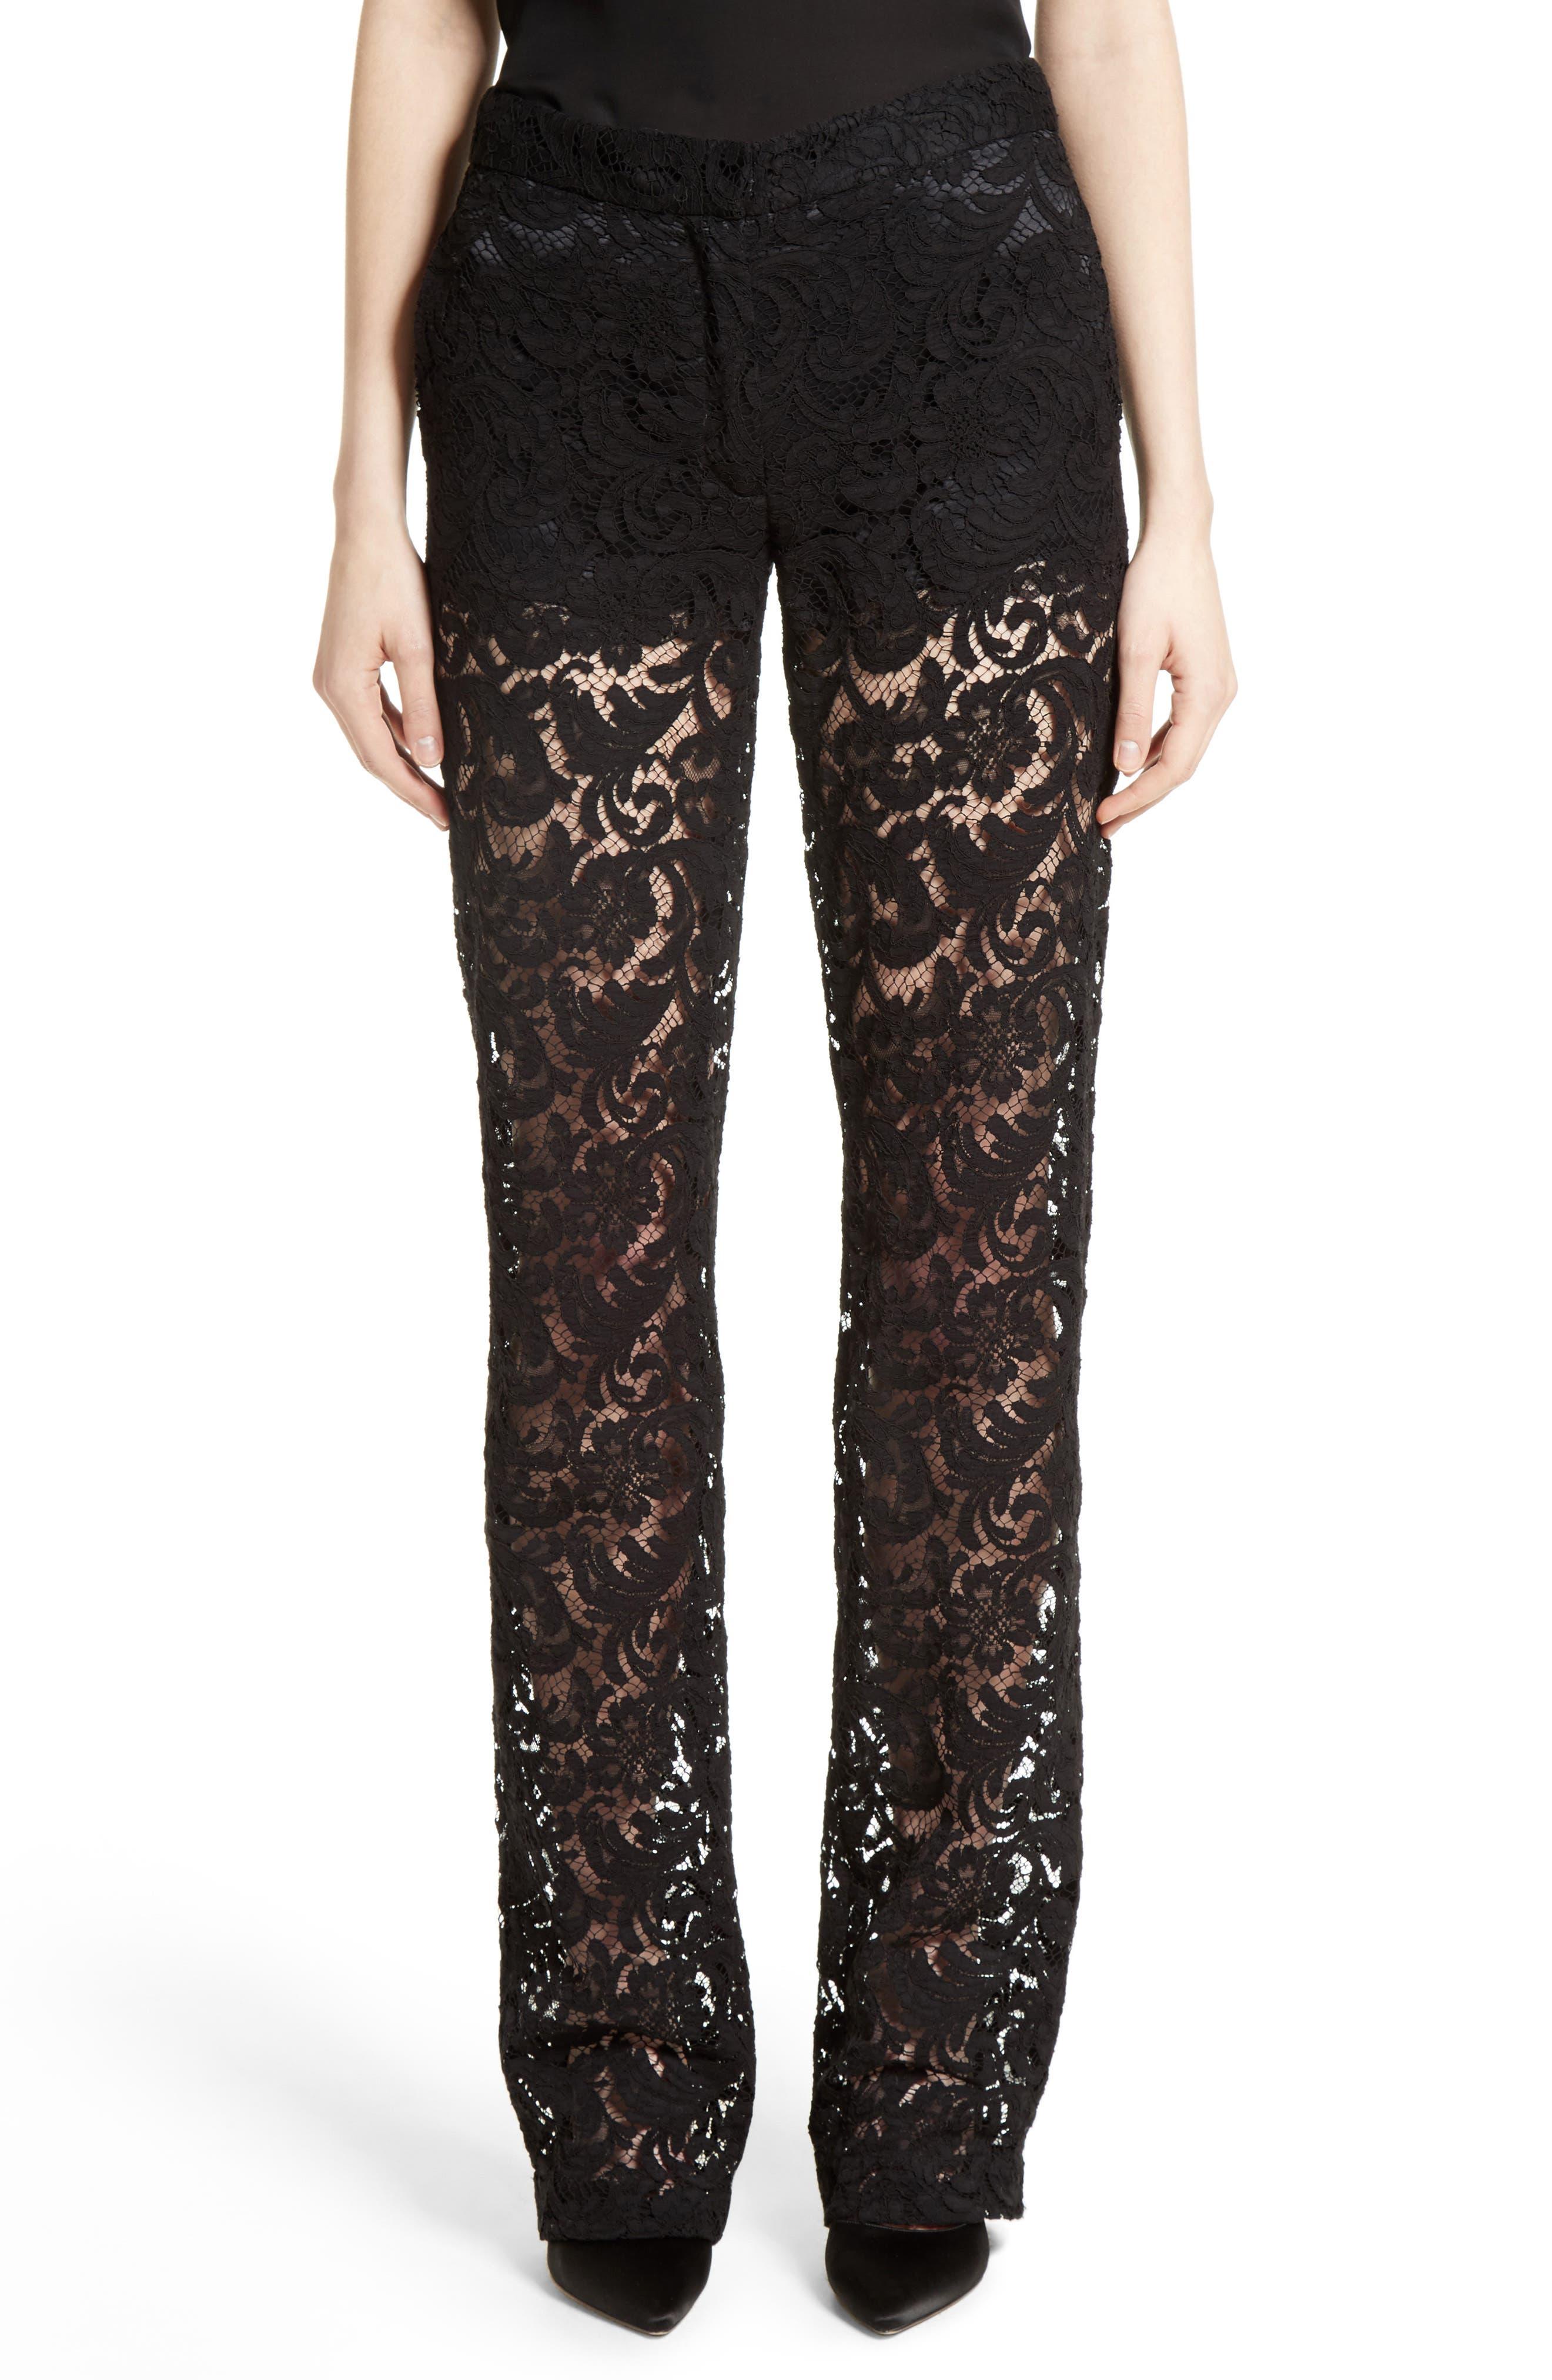 Lace Tuxedo Pants,                             Main thumbnail 1, color,                             001